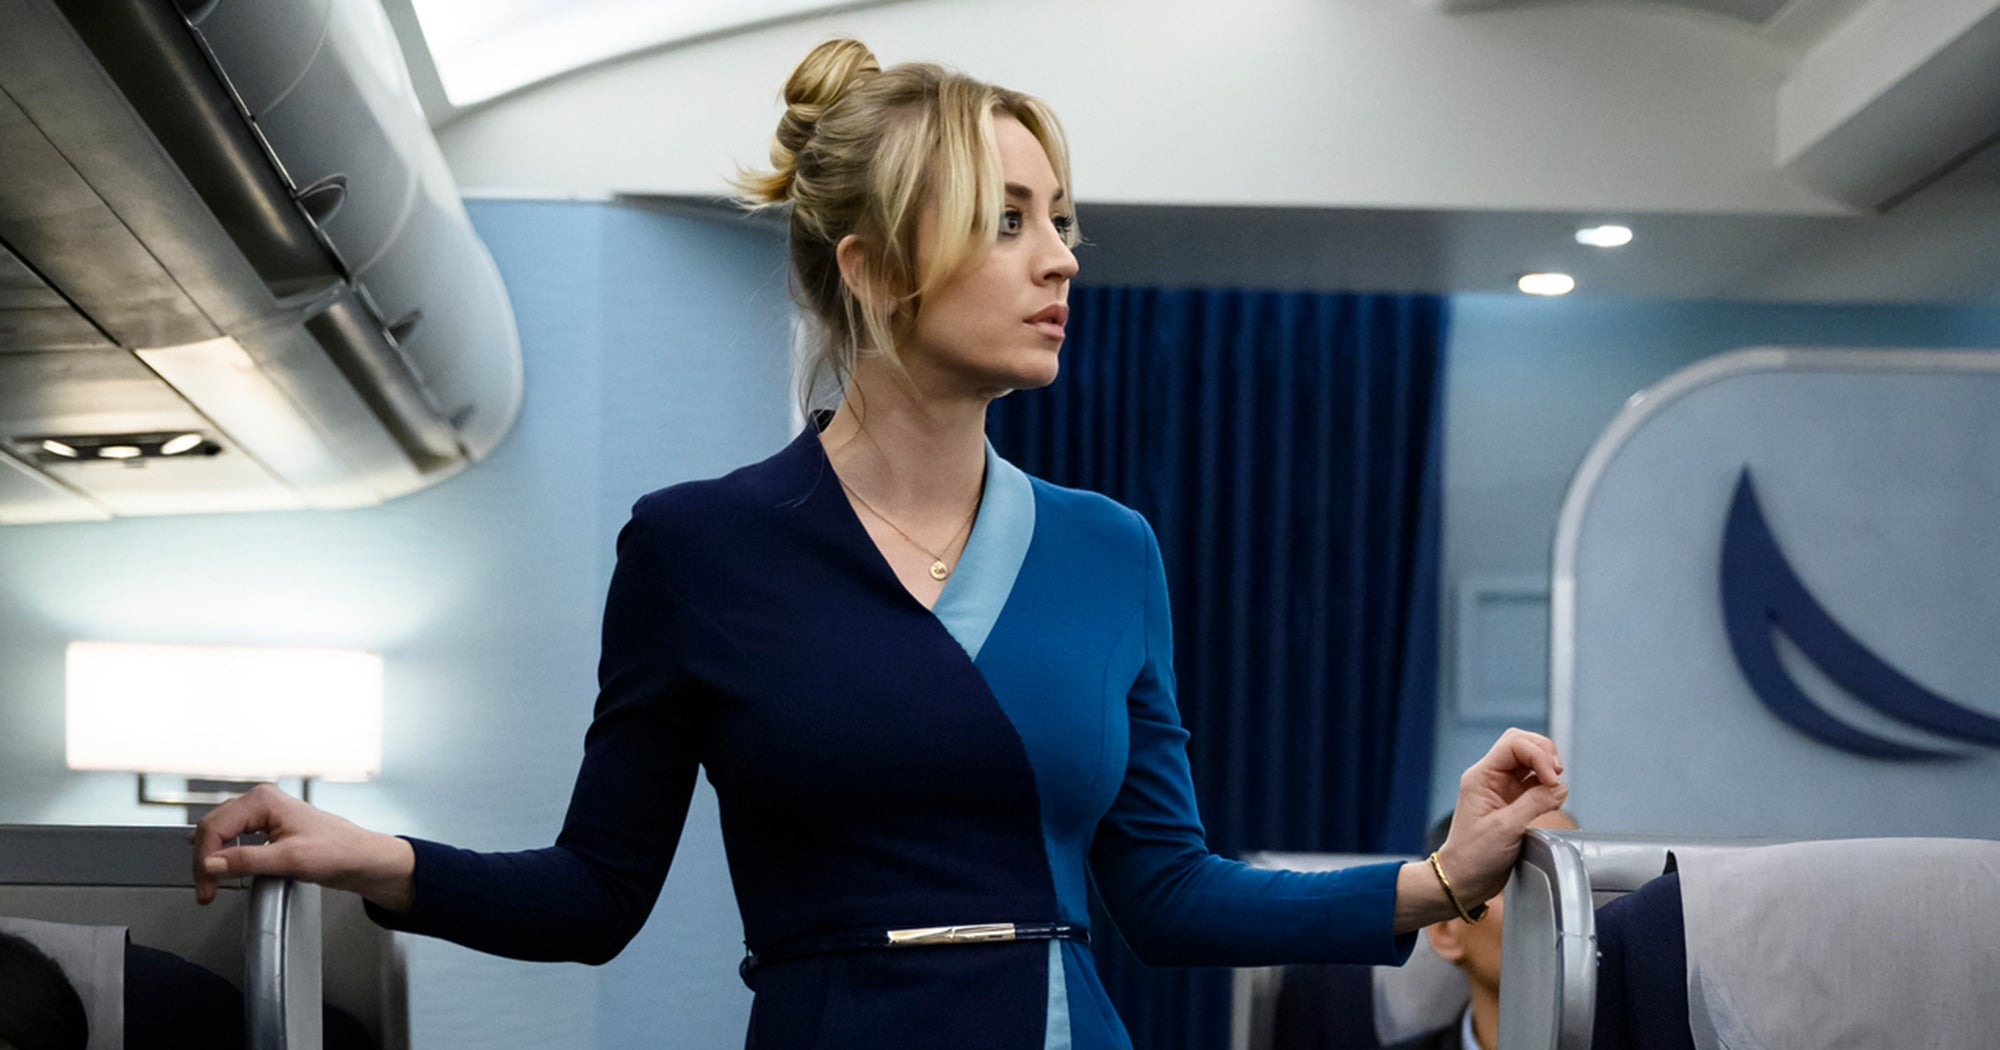 The Flight attendant série streaming